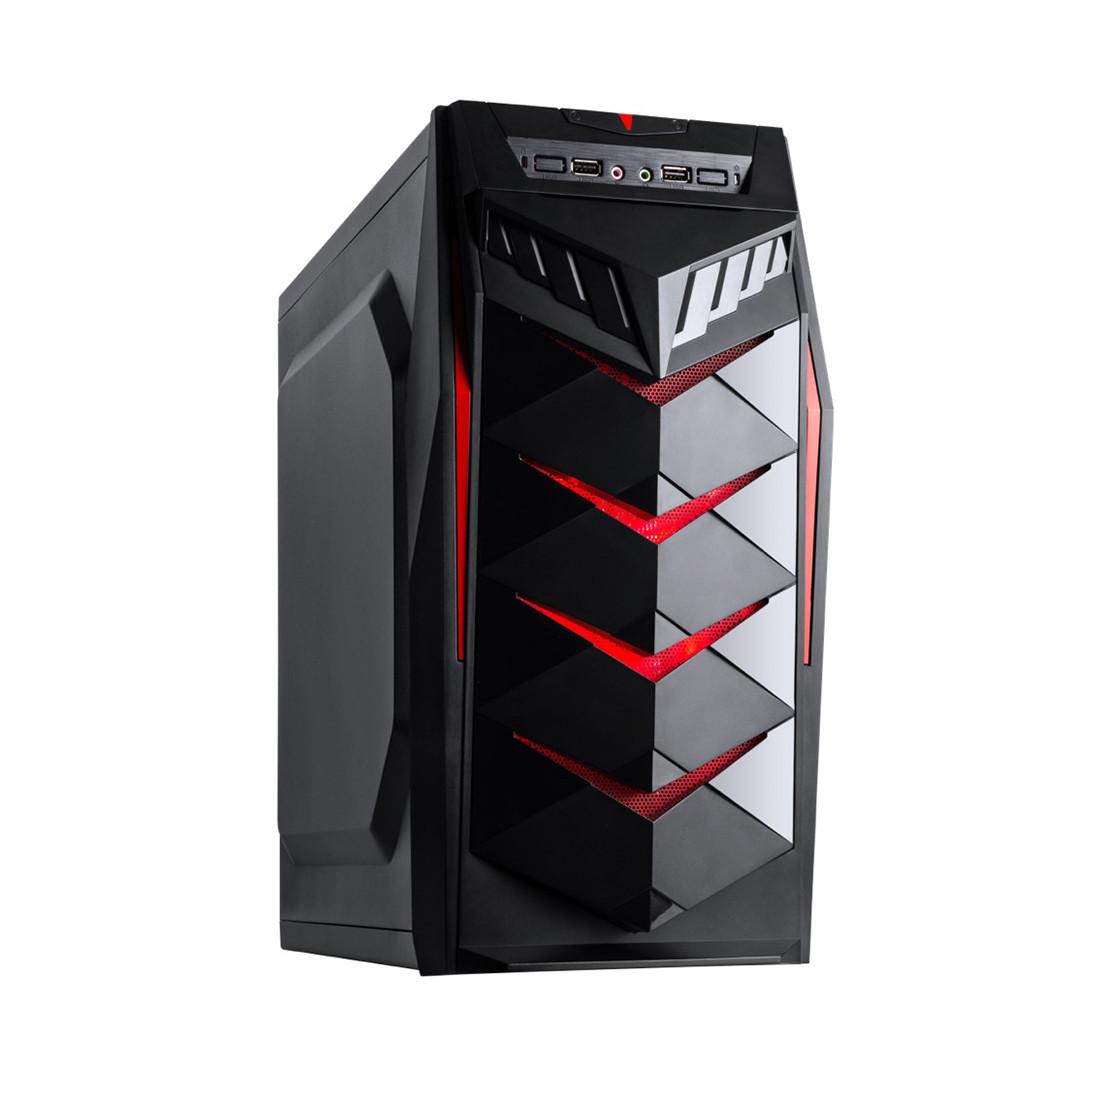 Системный блок, G5400, H310, RAM 4GB, SSD 120GB, 400W